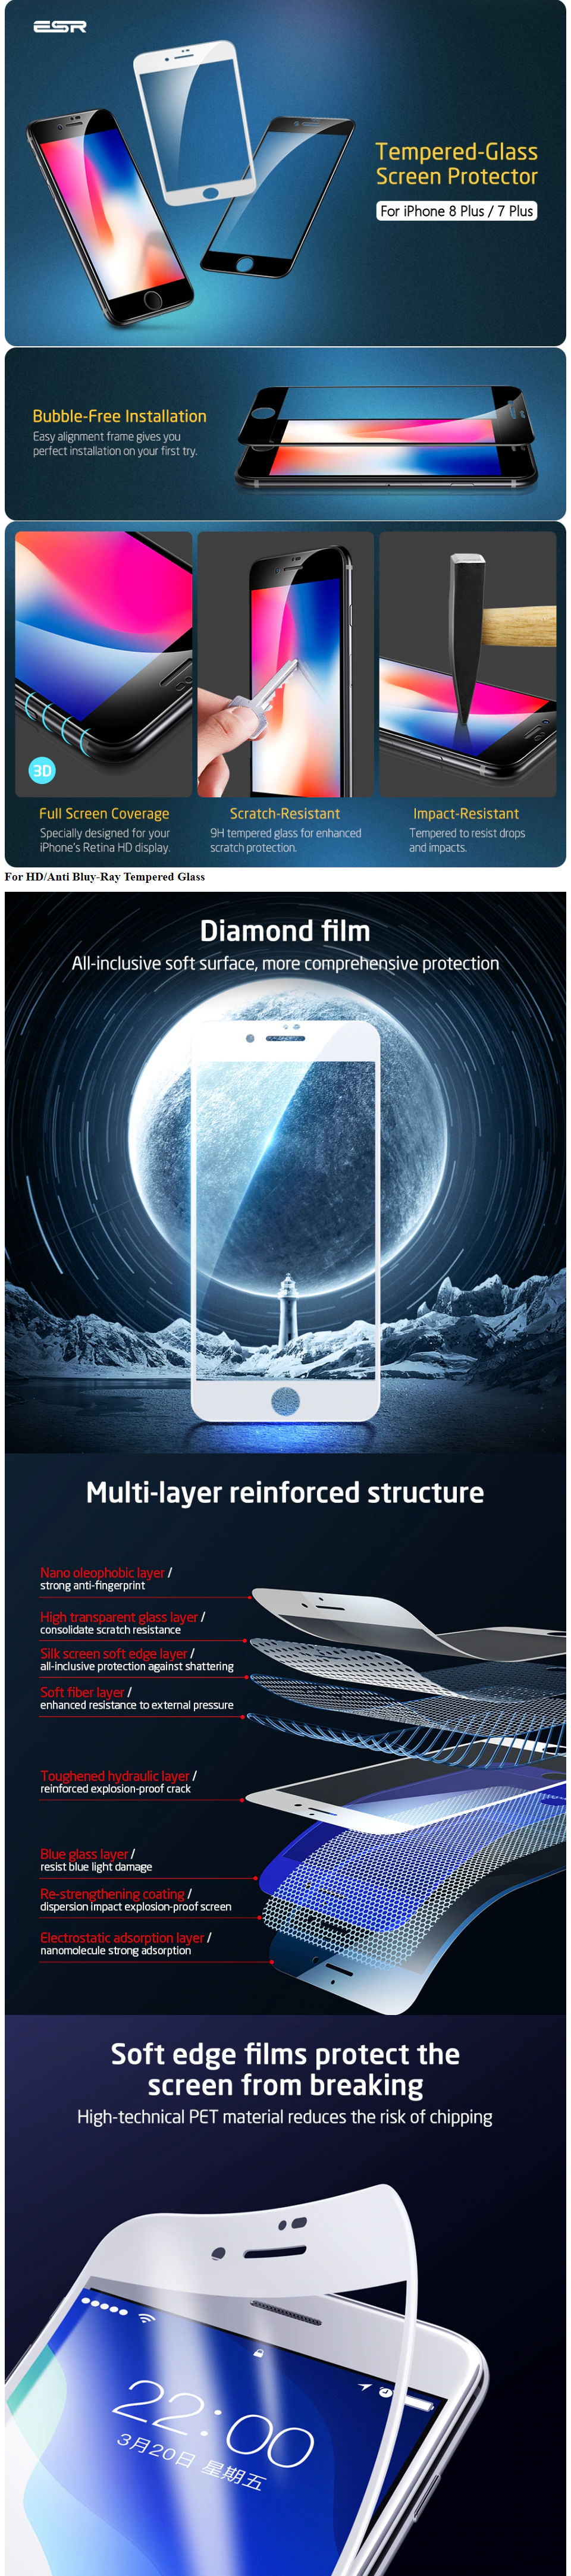 Gohub Shop iPhone Screen Protector